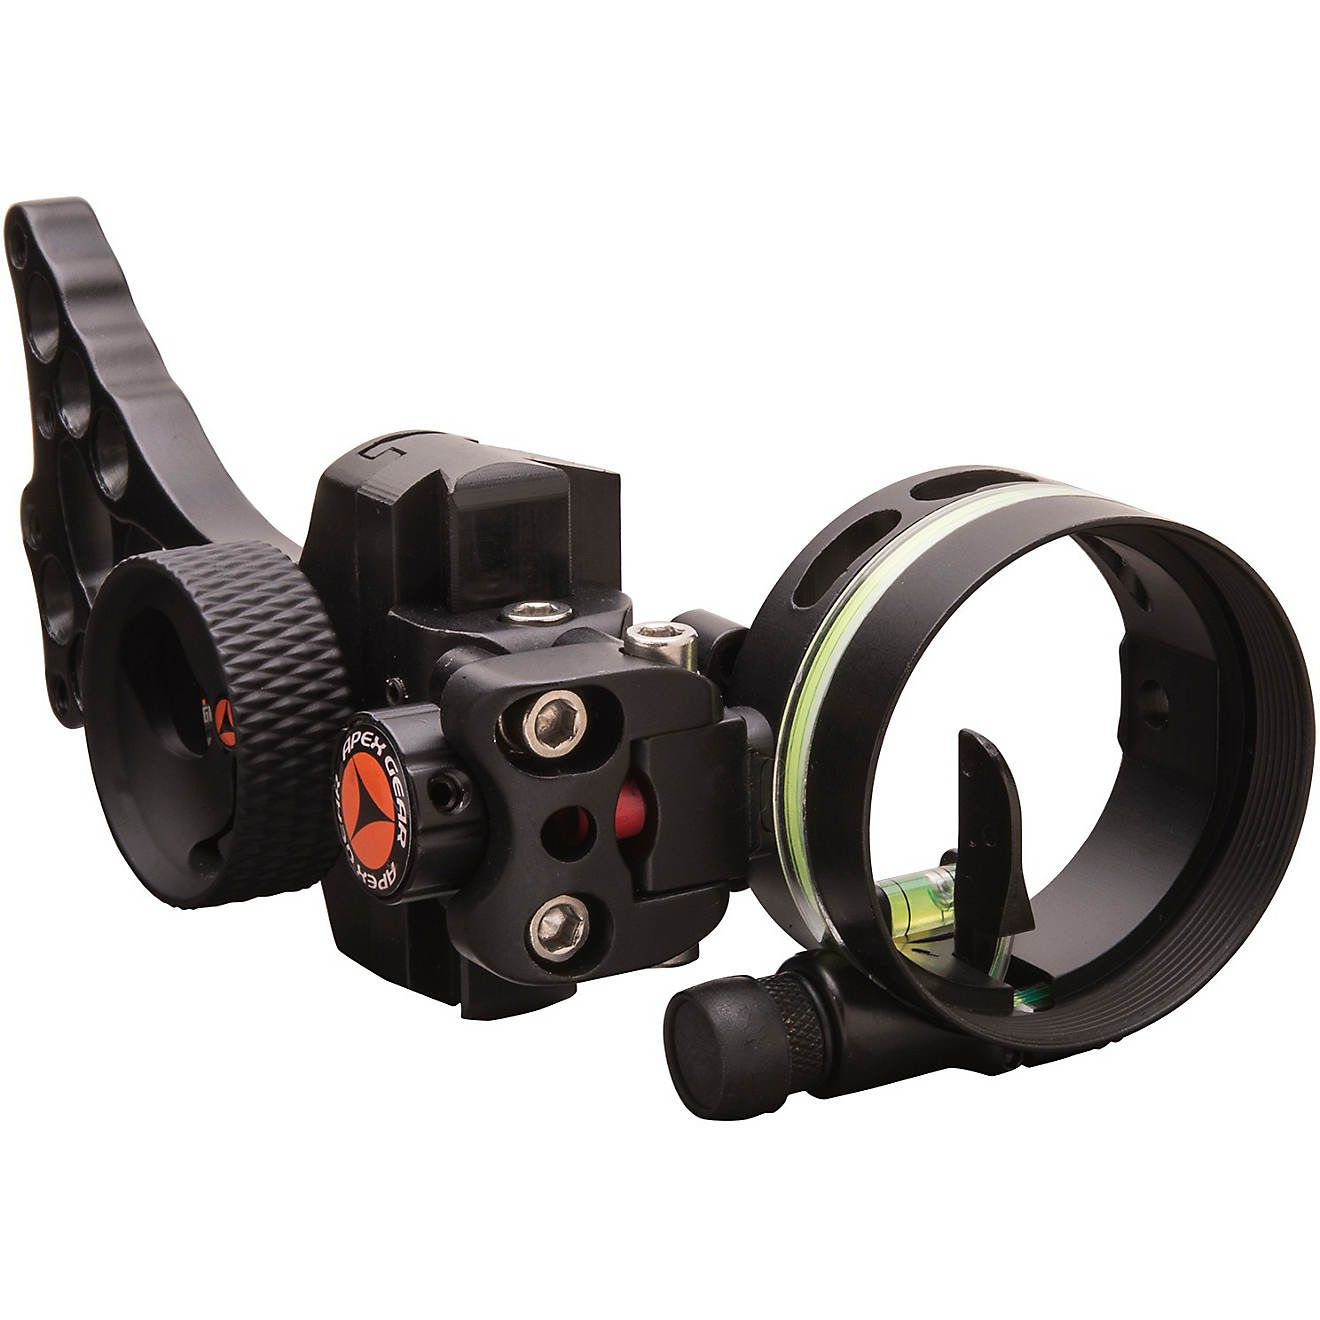 Truglo Apex Gear Covert 1 Single-Pin Archery Sight, Ambidextrous, green